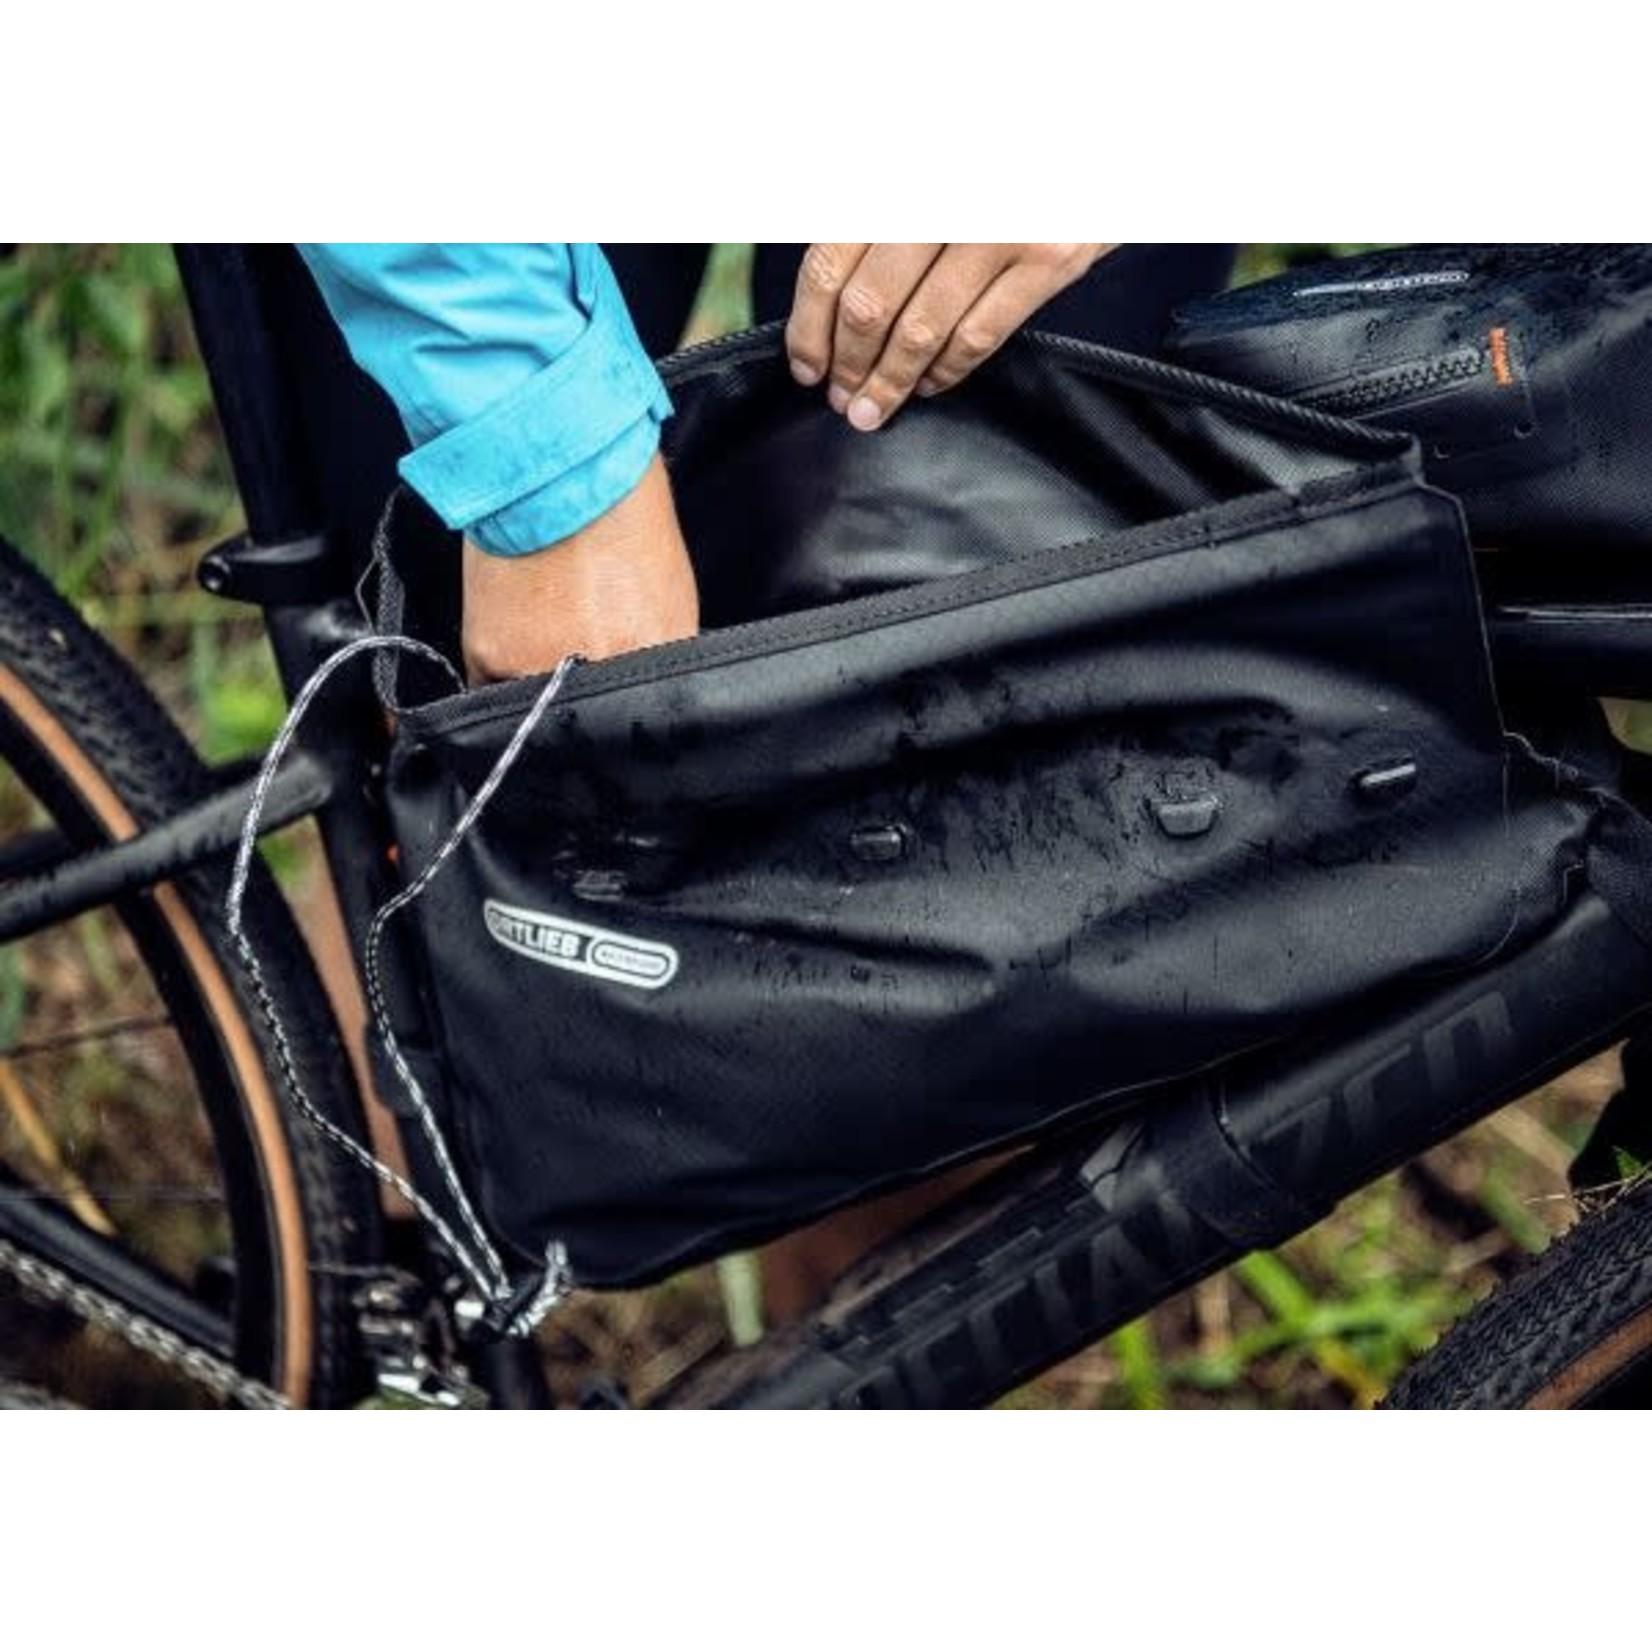 Ortlieb Bike Pack Ortlieb Frame-Pack RC 6 L black-matt